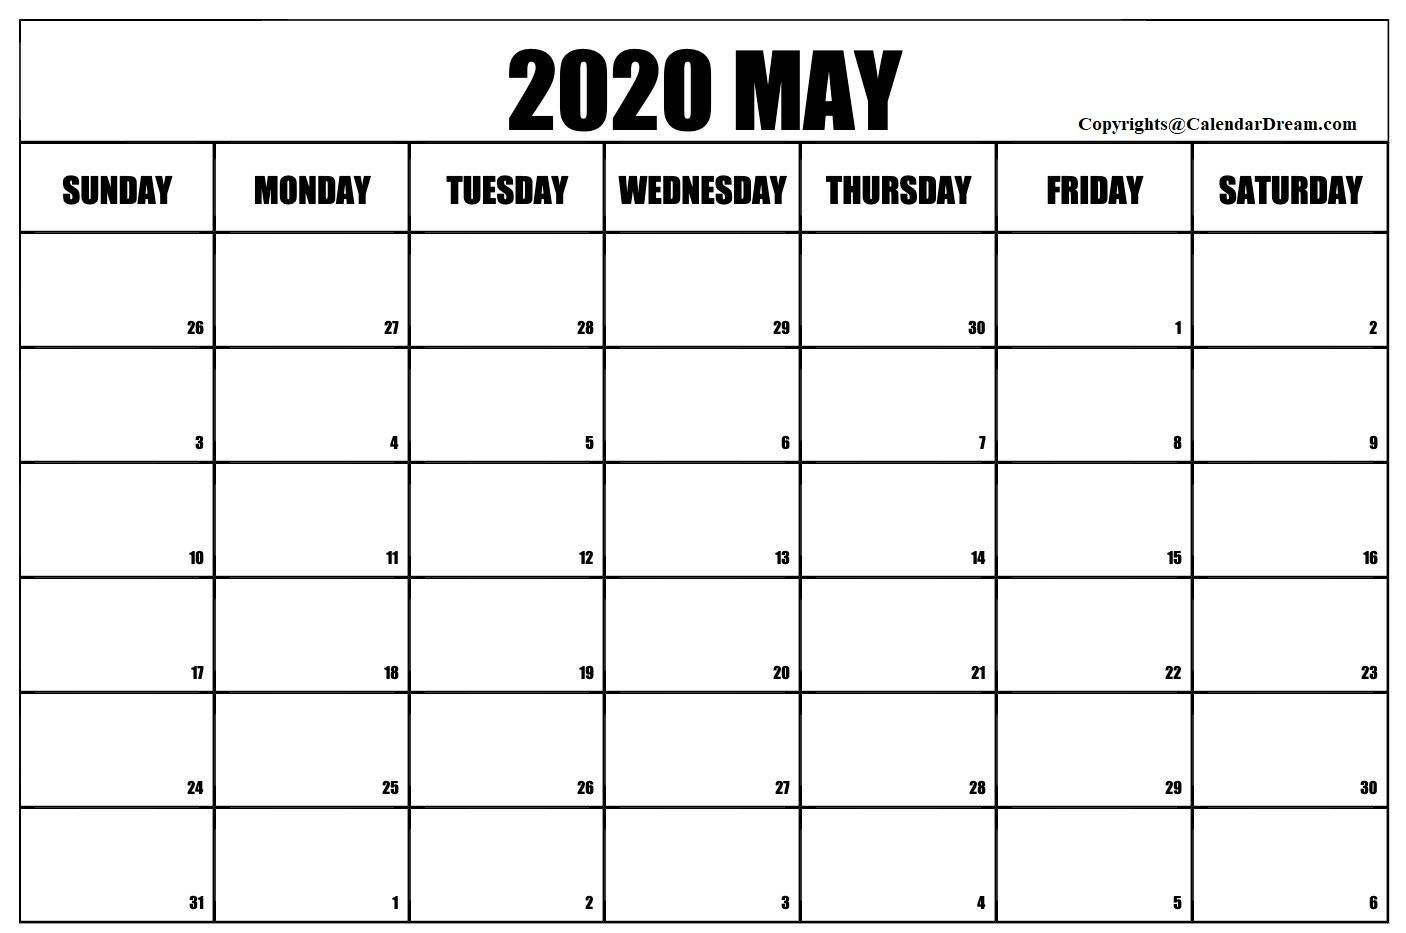 Free Blank May 2020 Printable Calendar Template [Pdf